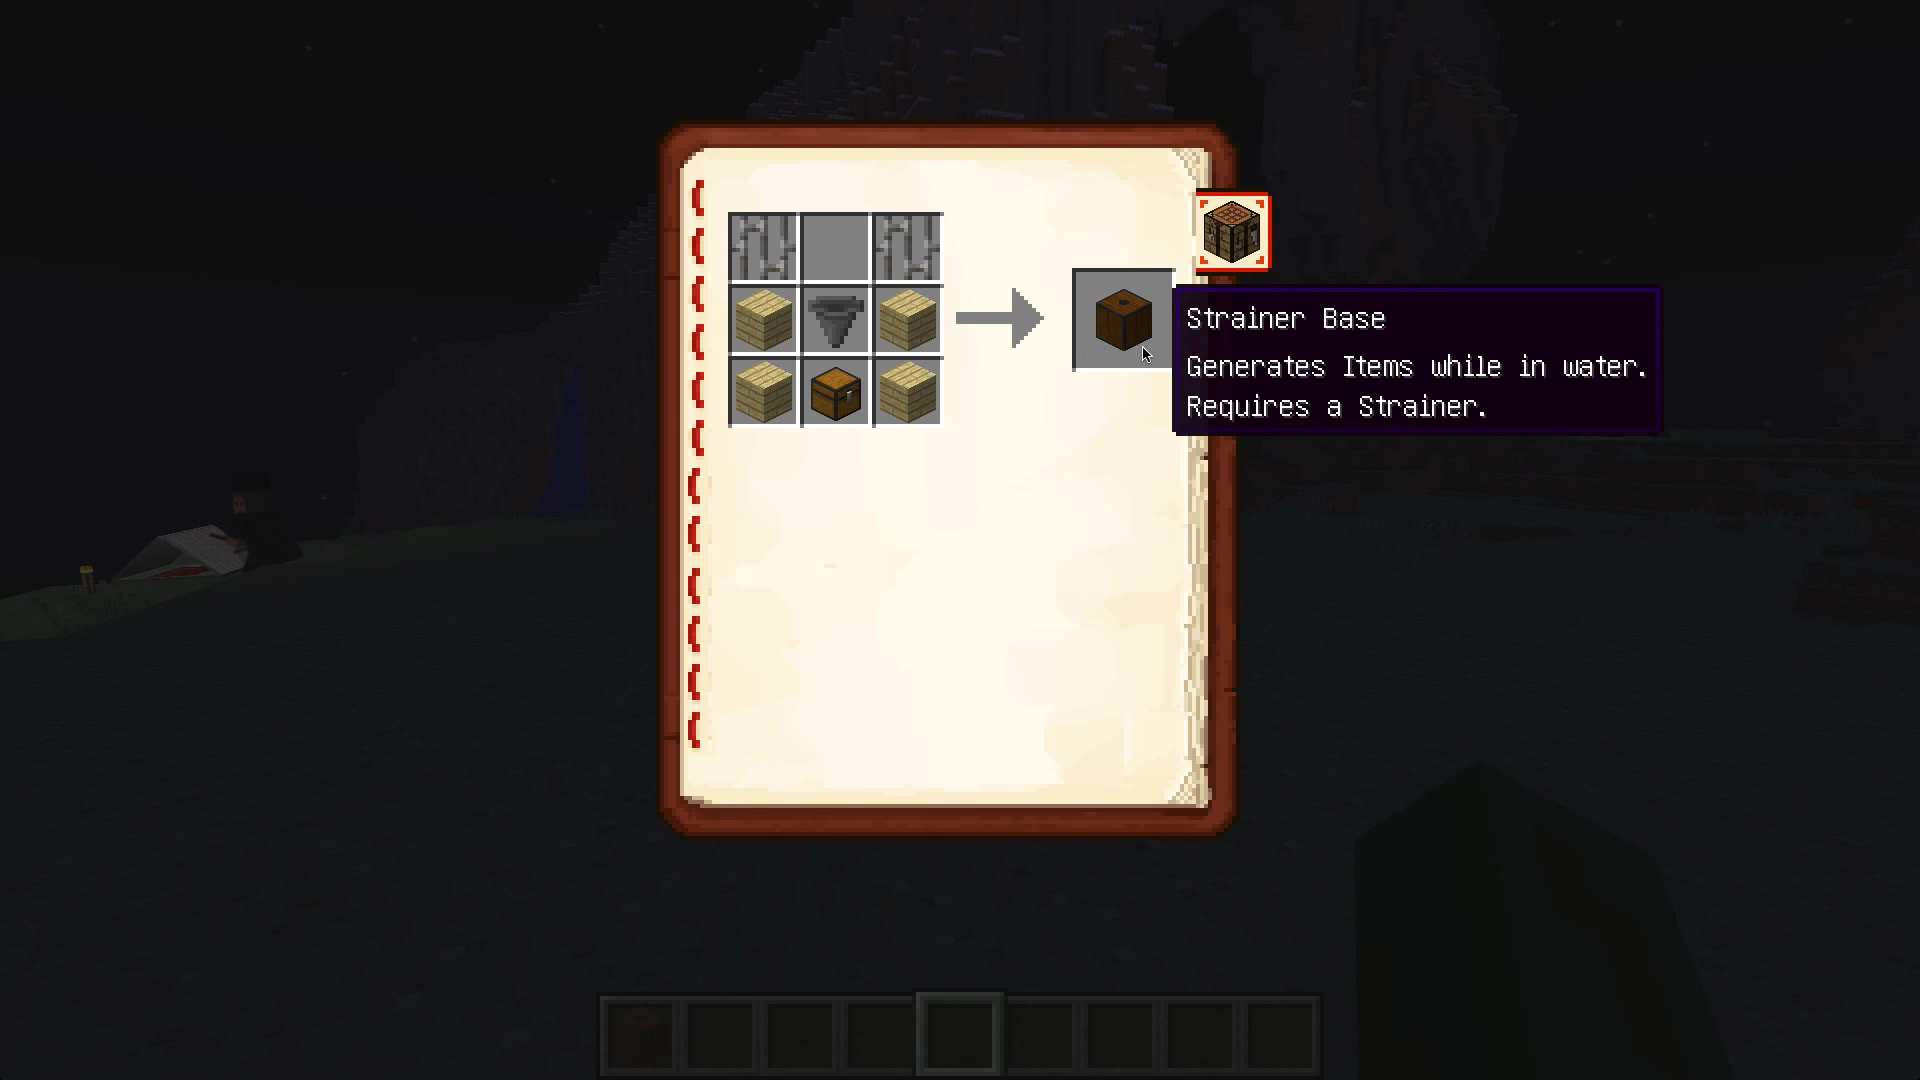 Мод «Water Strainer» (Фильтры для воды) дляМайнкрафт - скриншот 6